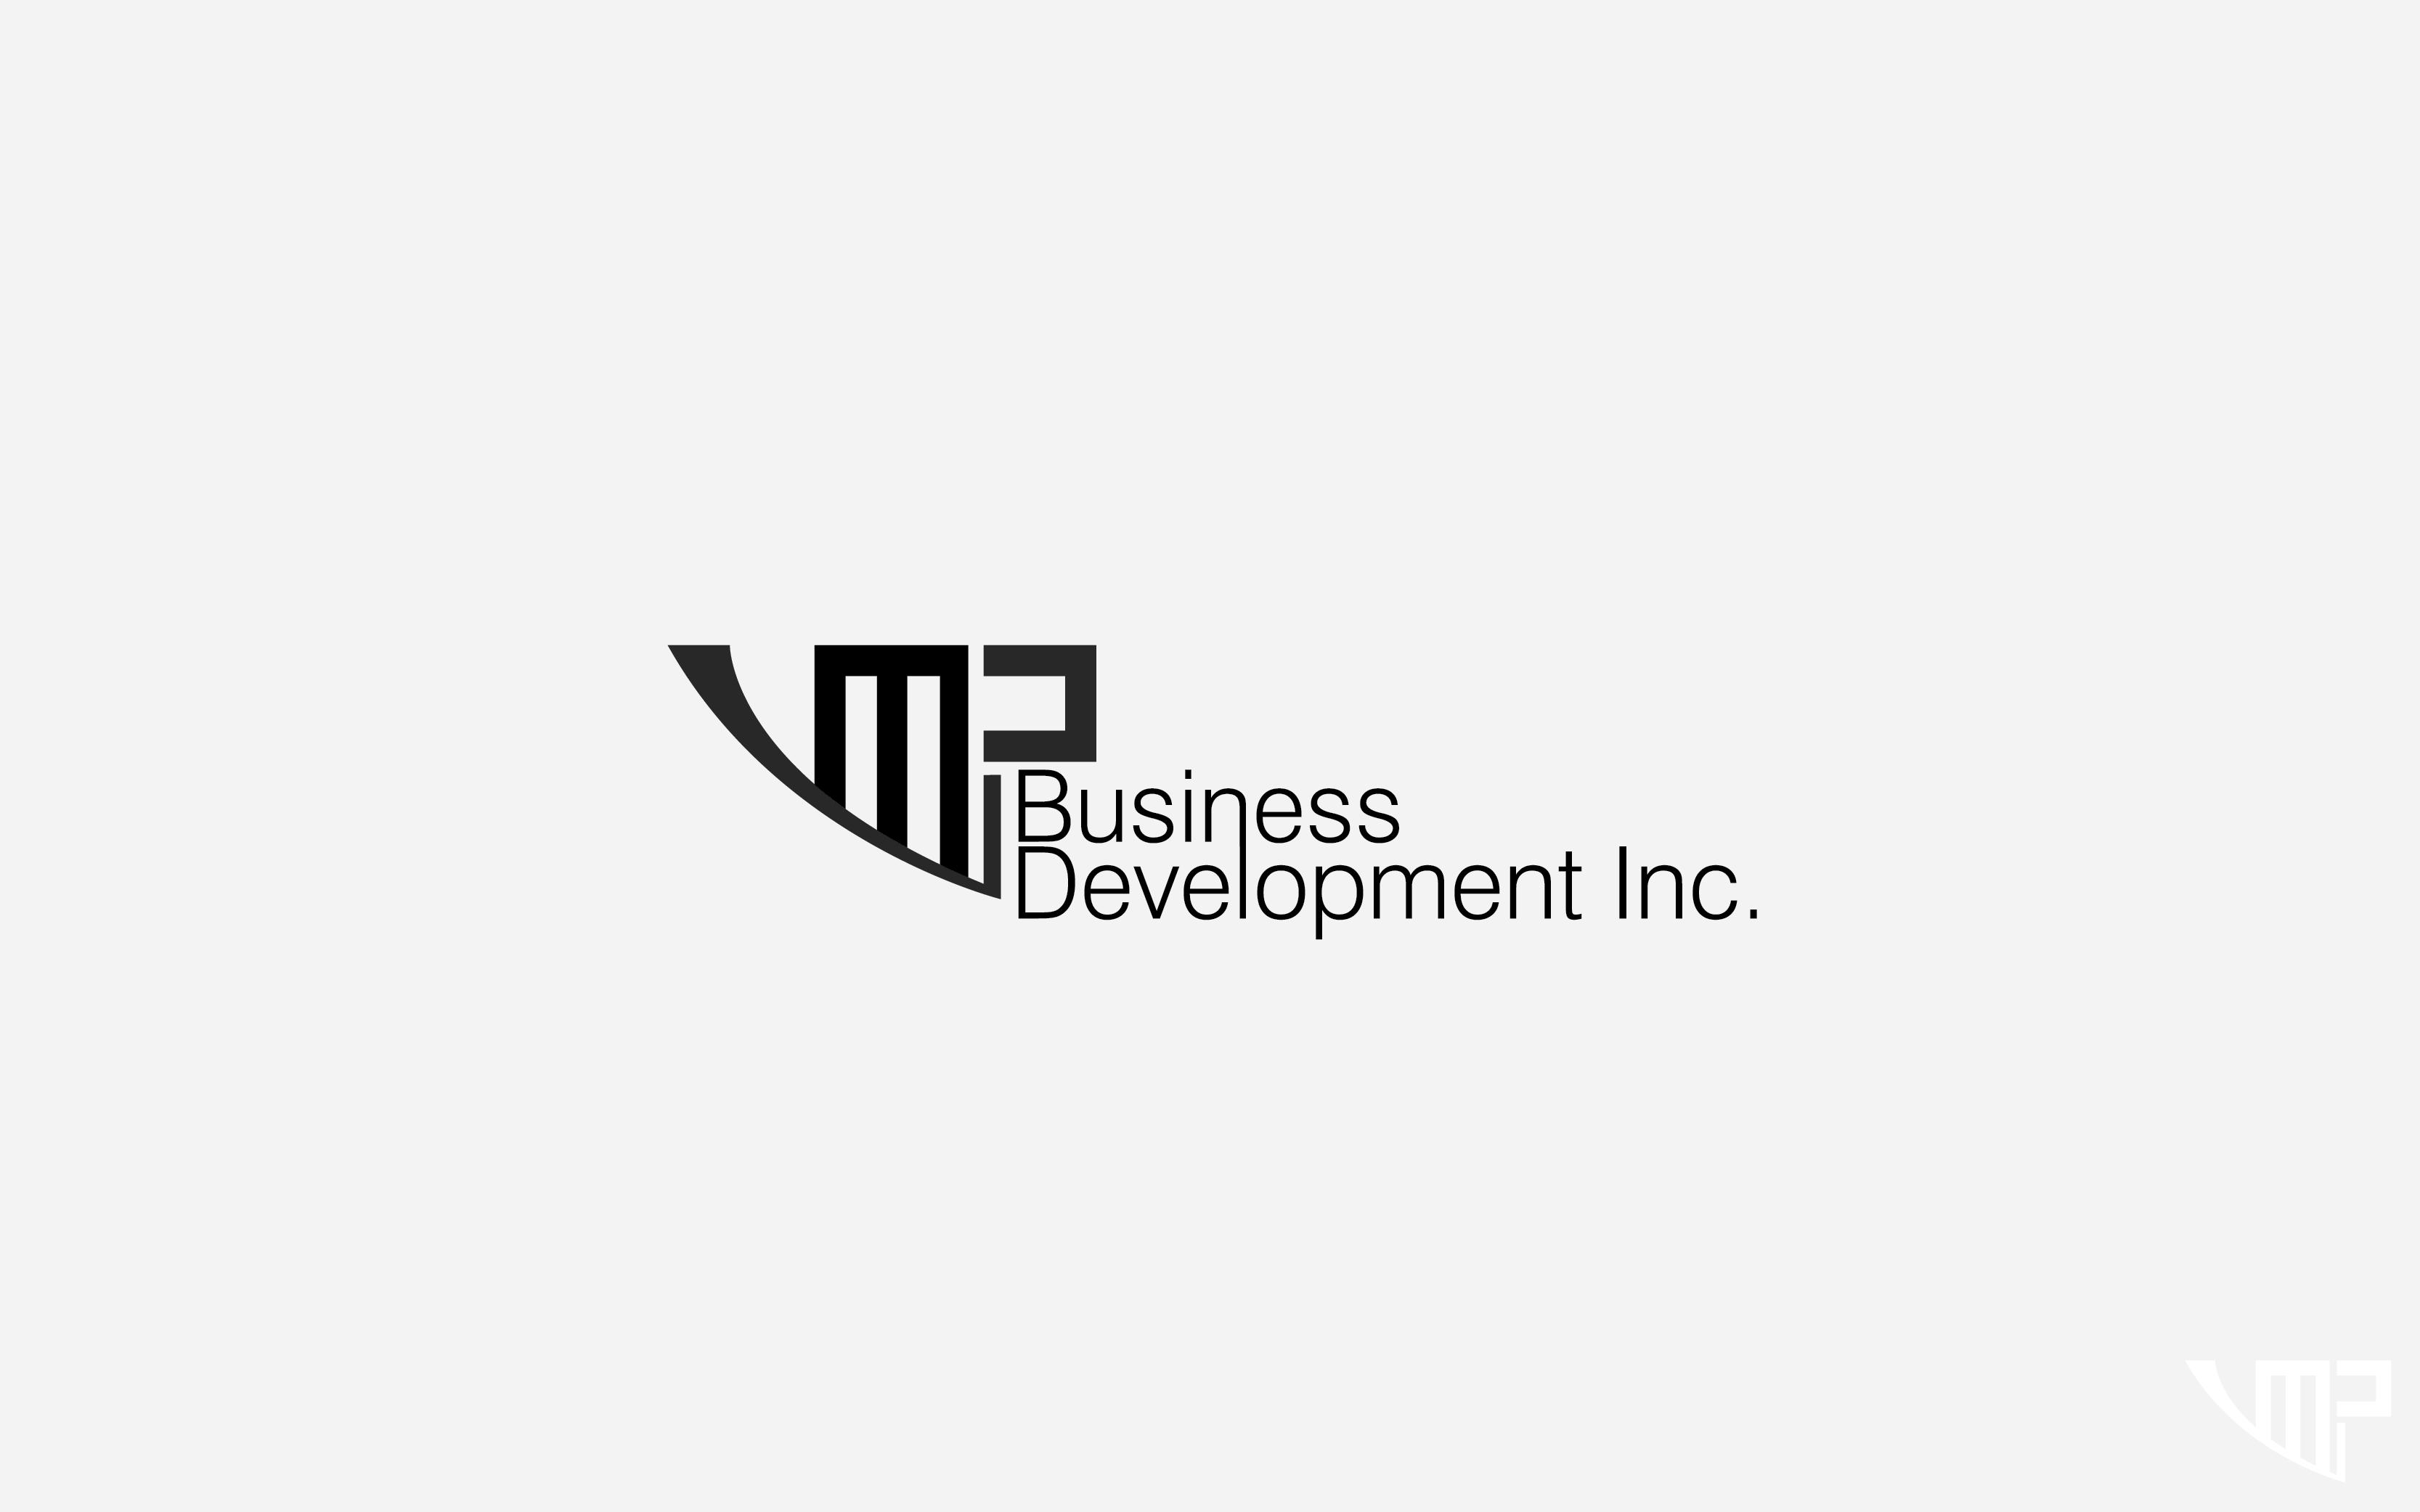 Logo Design by Private User - Entry No. 30 in the Logo Design Contest MP Business Development Inc. Logo Design.